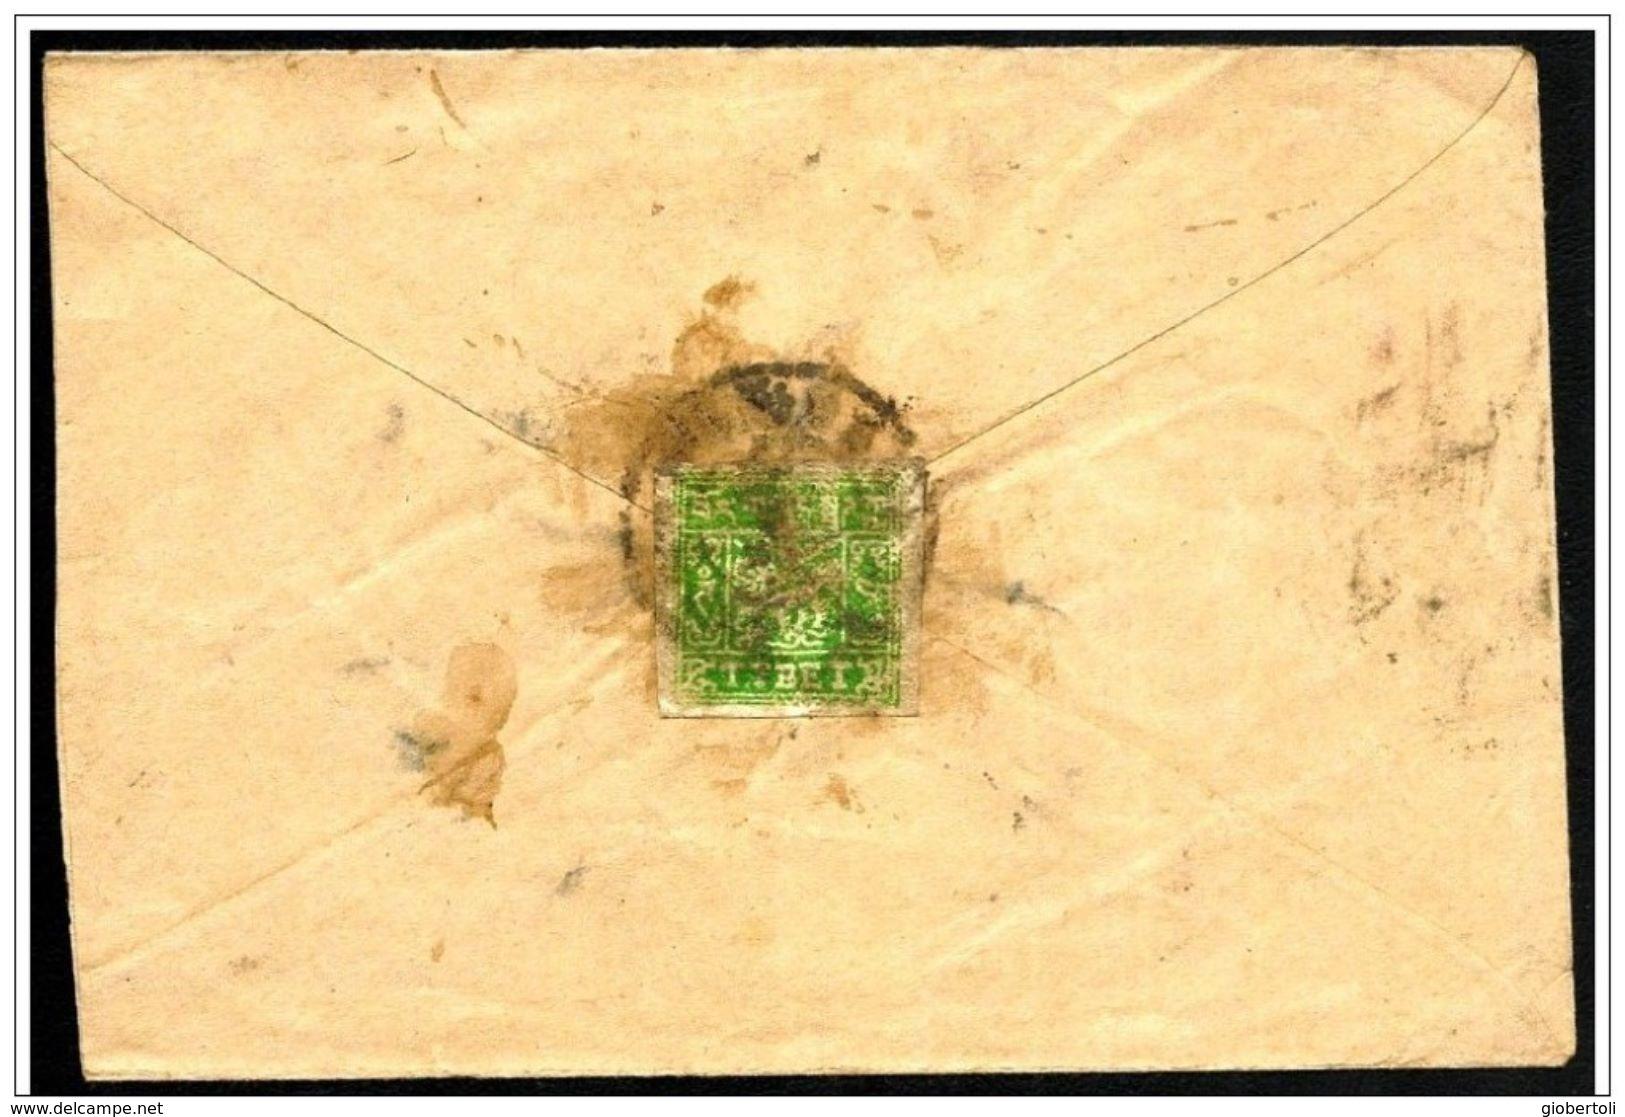 Cina/China/Chine (Tibet): Storia Postale, Histoire Postale, Postal History - Altri